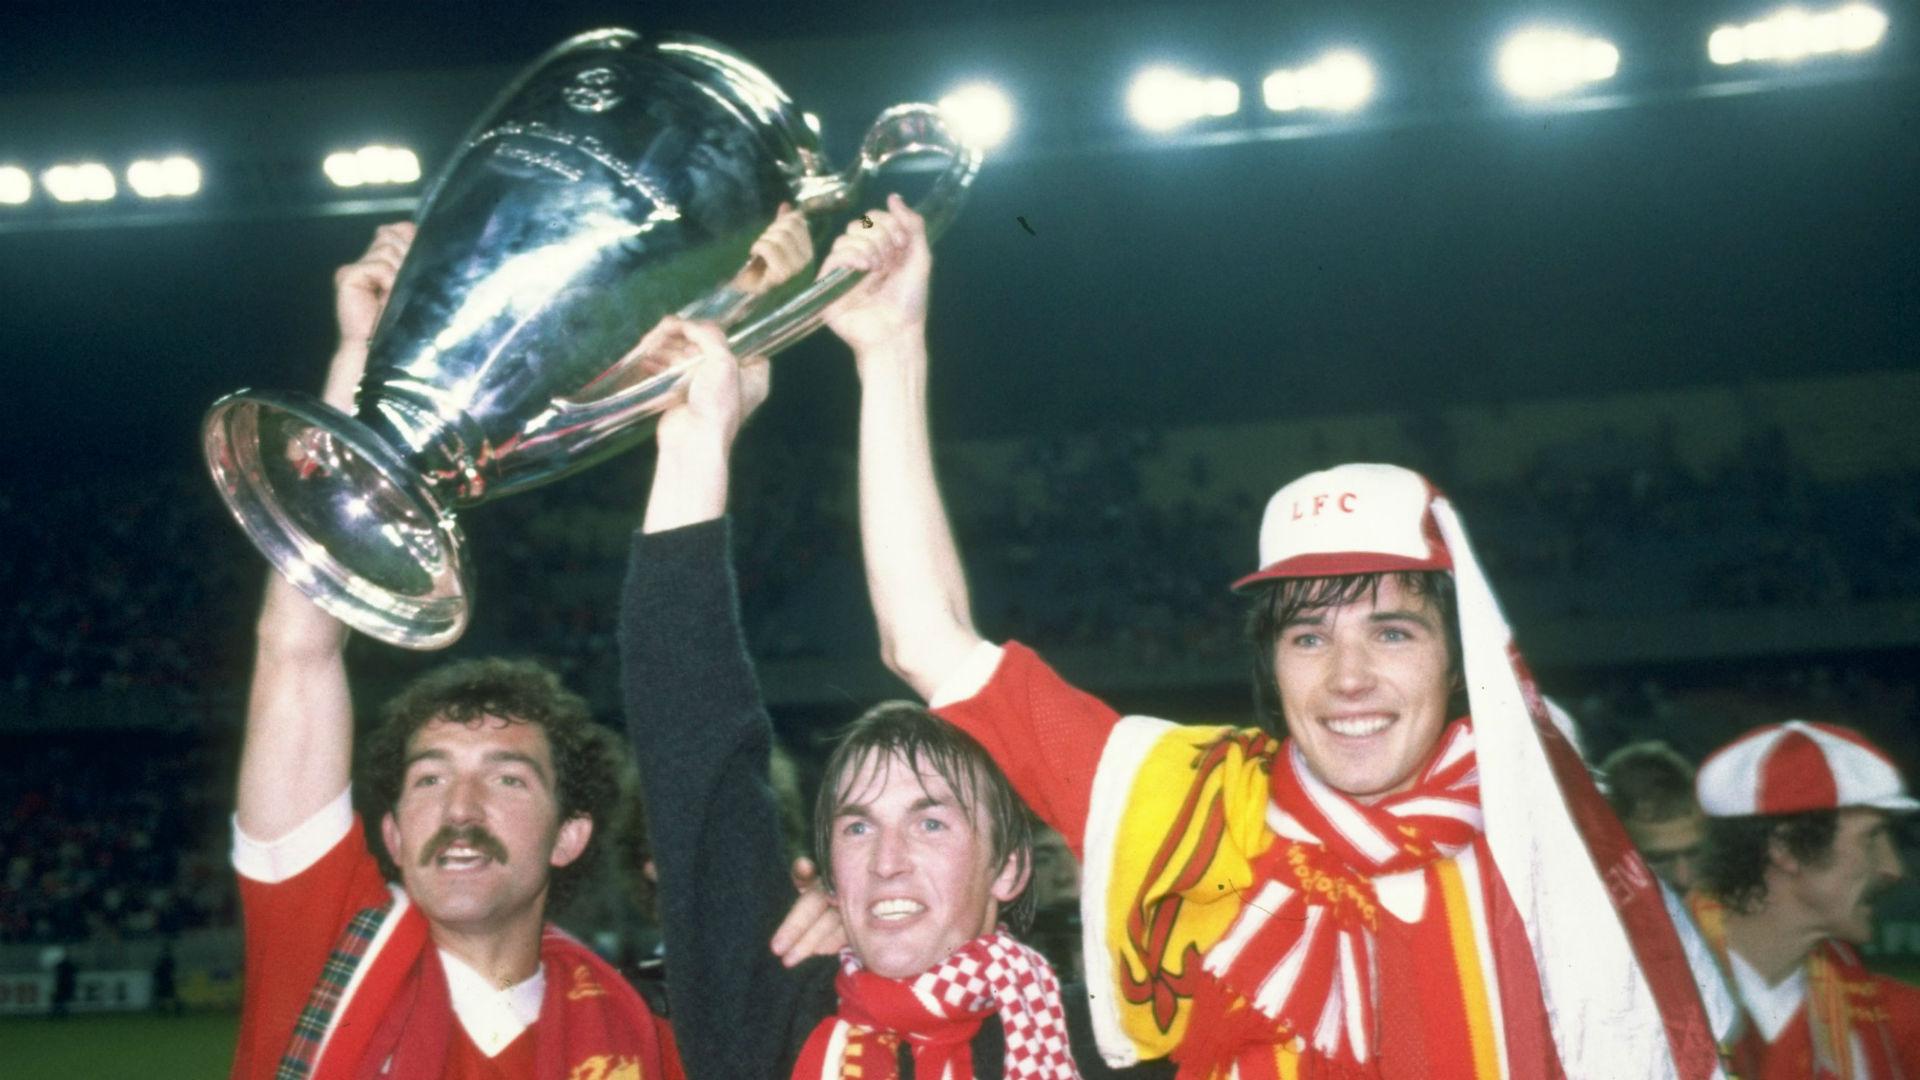 Graeme Souness Kenny Dalglish Alan Hansen Liverpool European Cup 1981